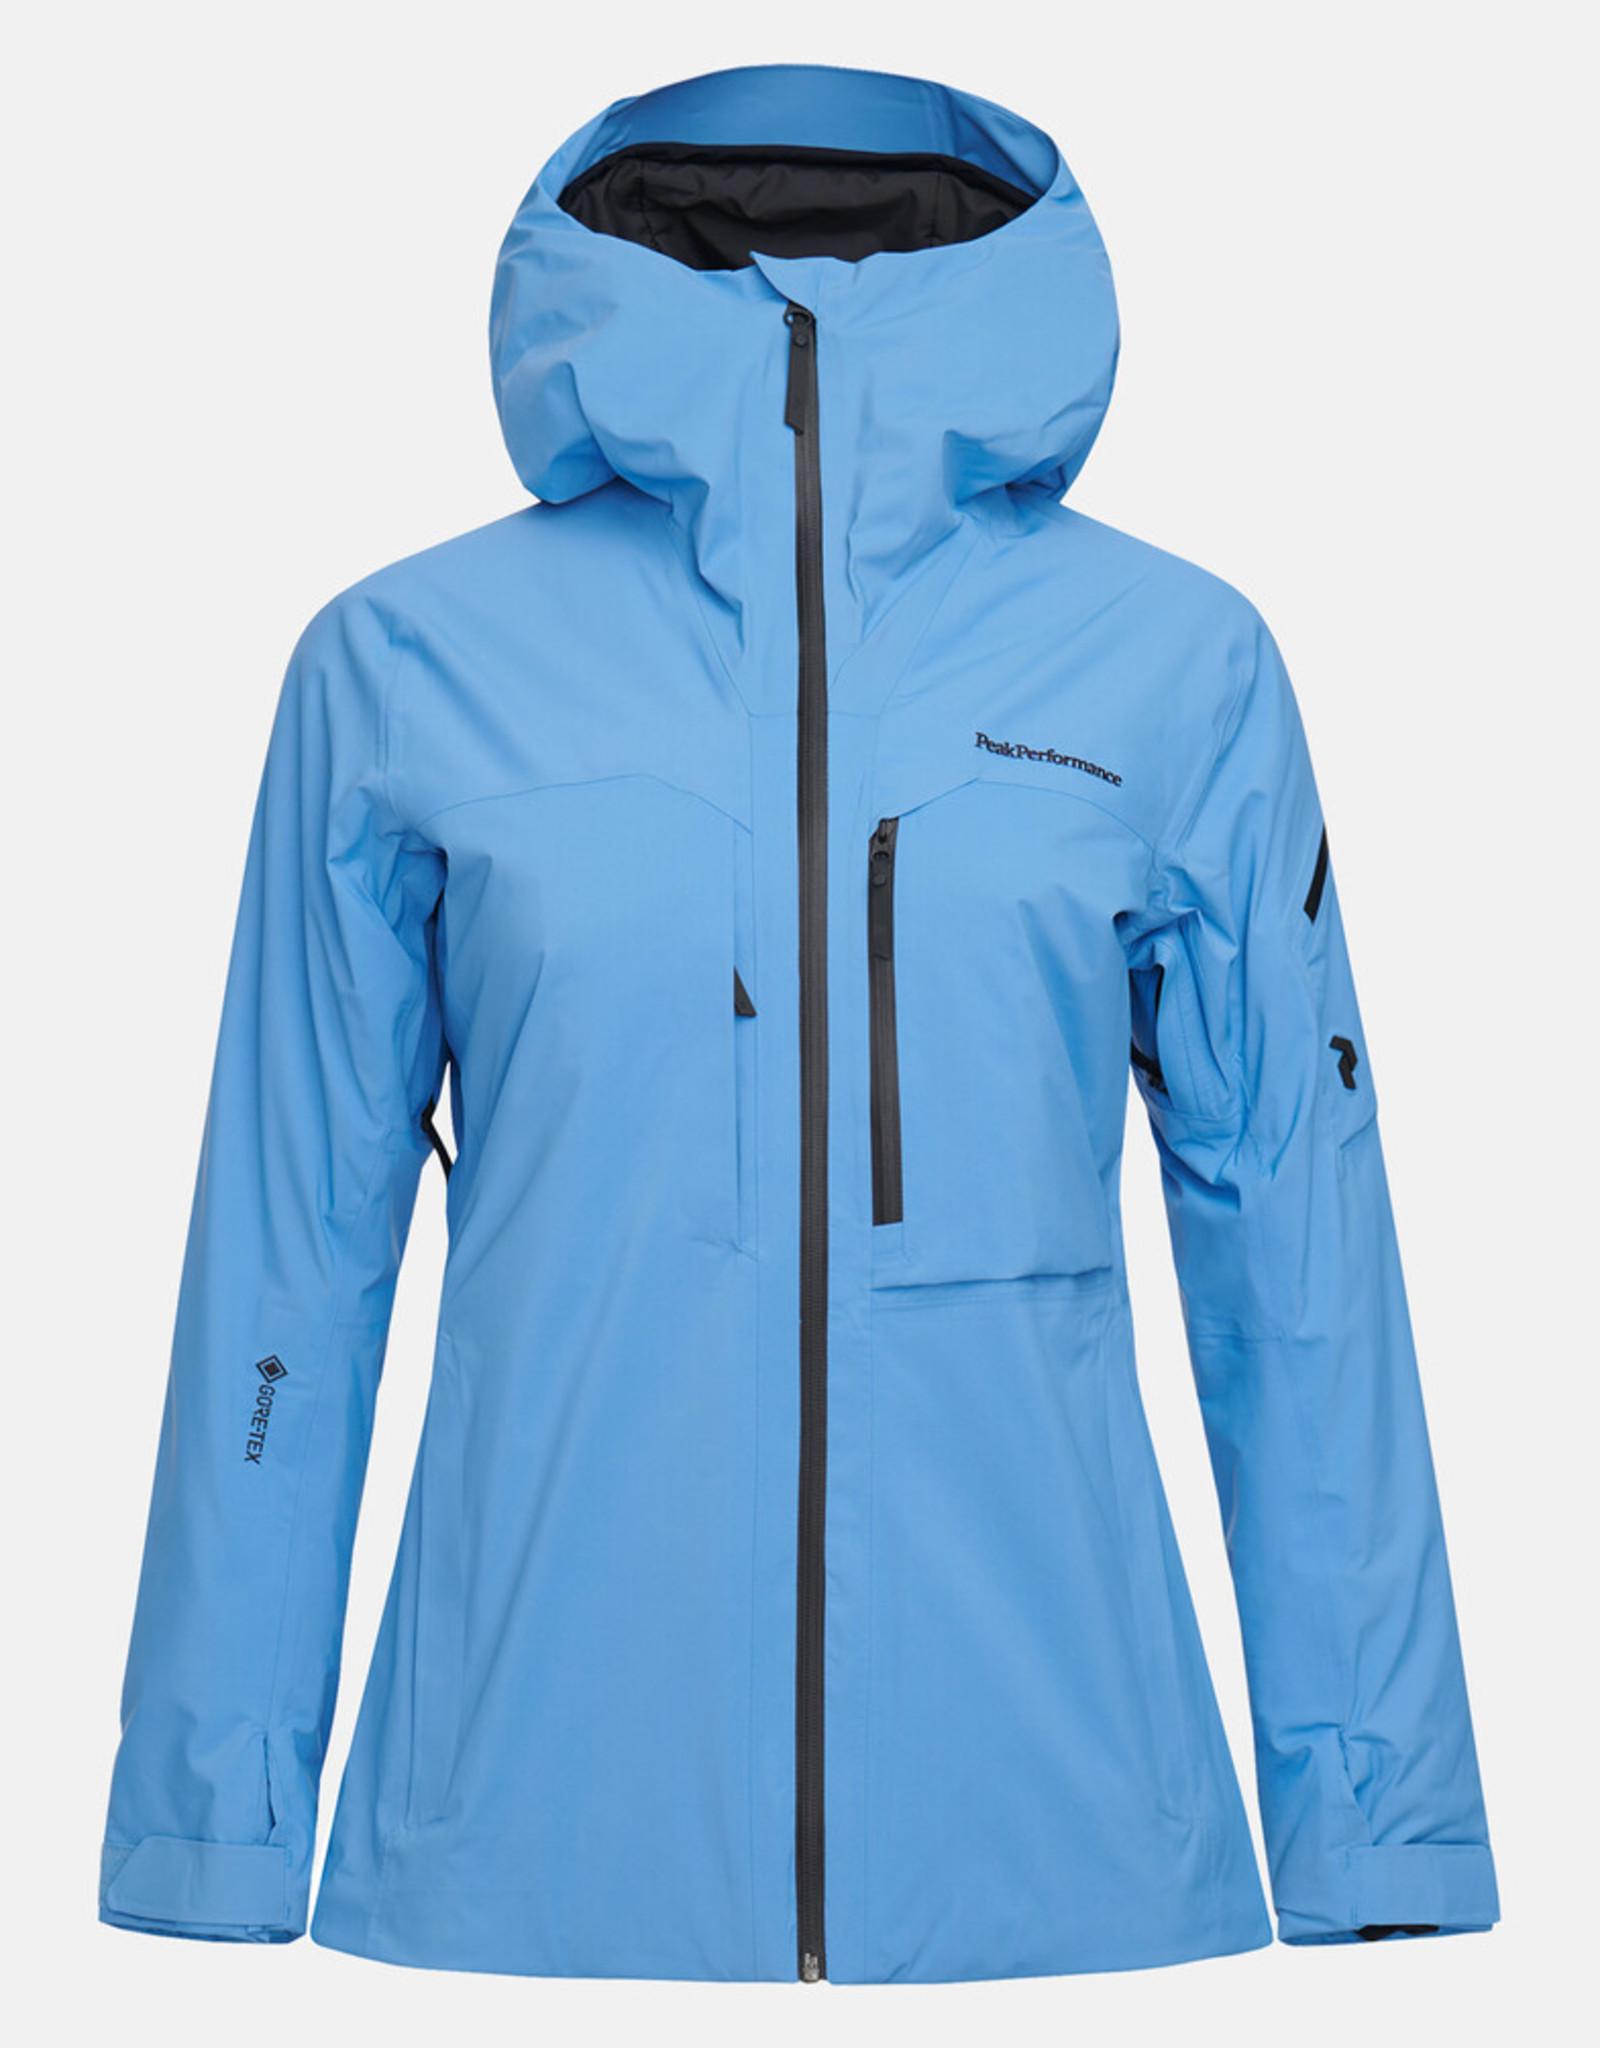 Peak Performance Peak Performance Women's Alpine 2L Jacket  -W2020